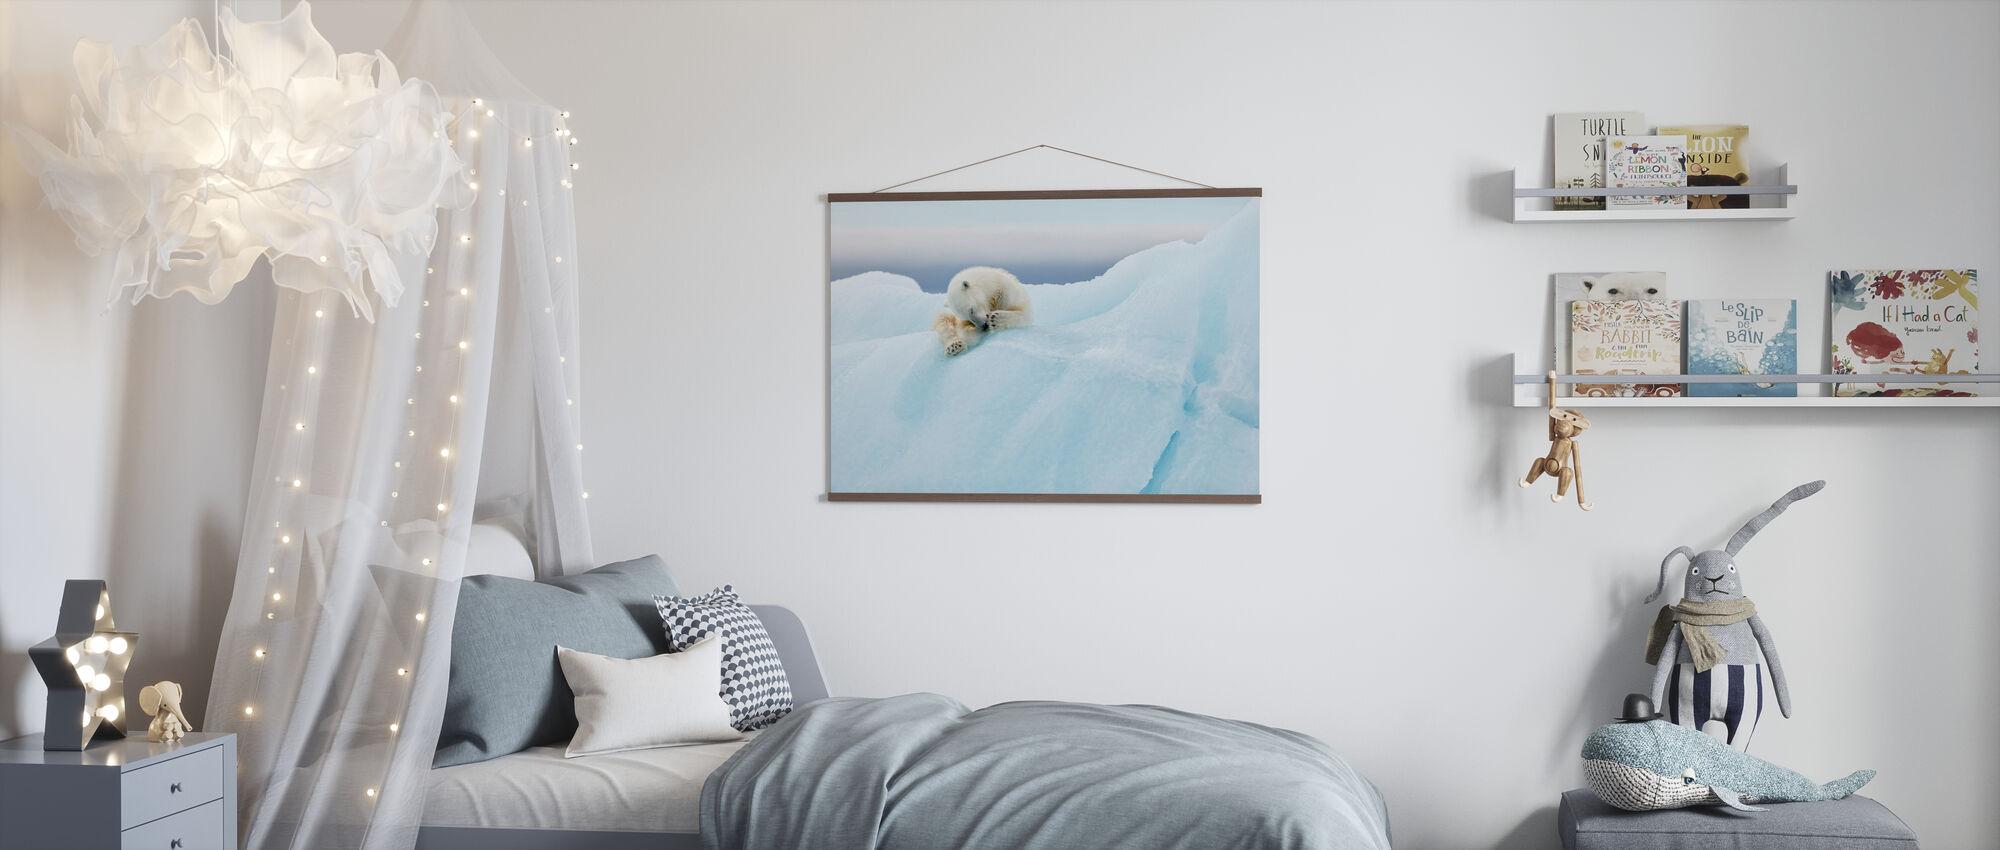 Polar Bear Grooming - Poster - Kids Room